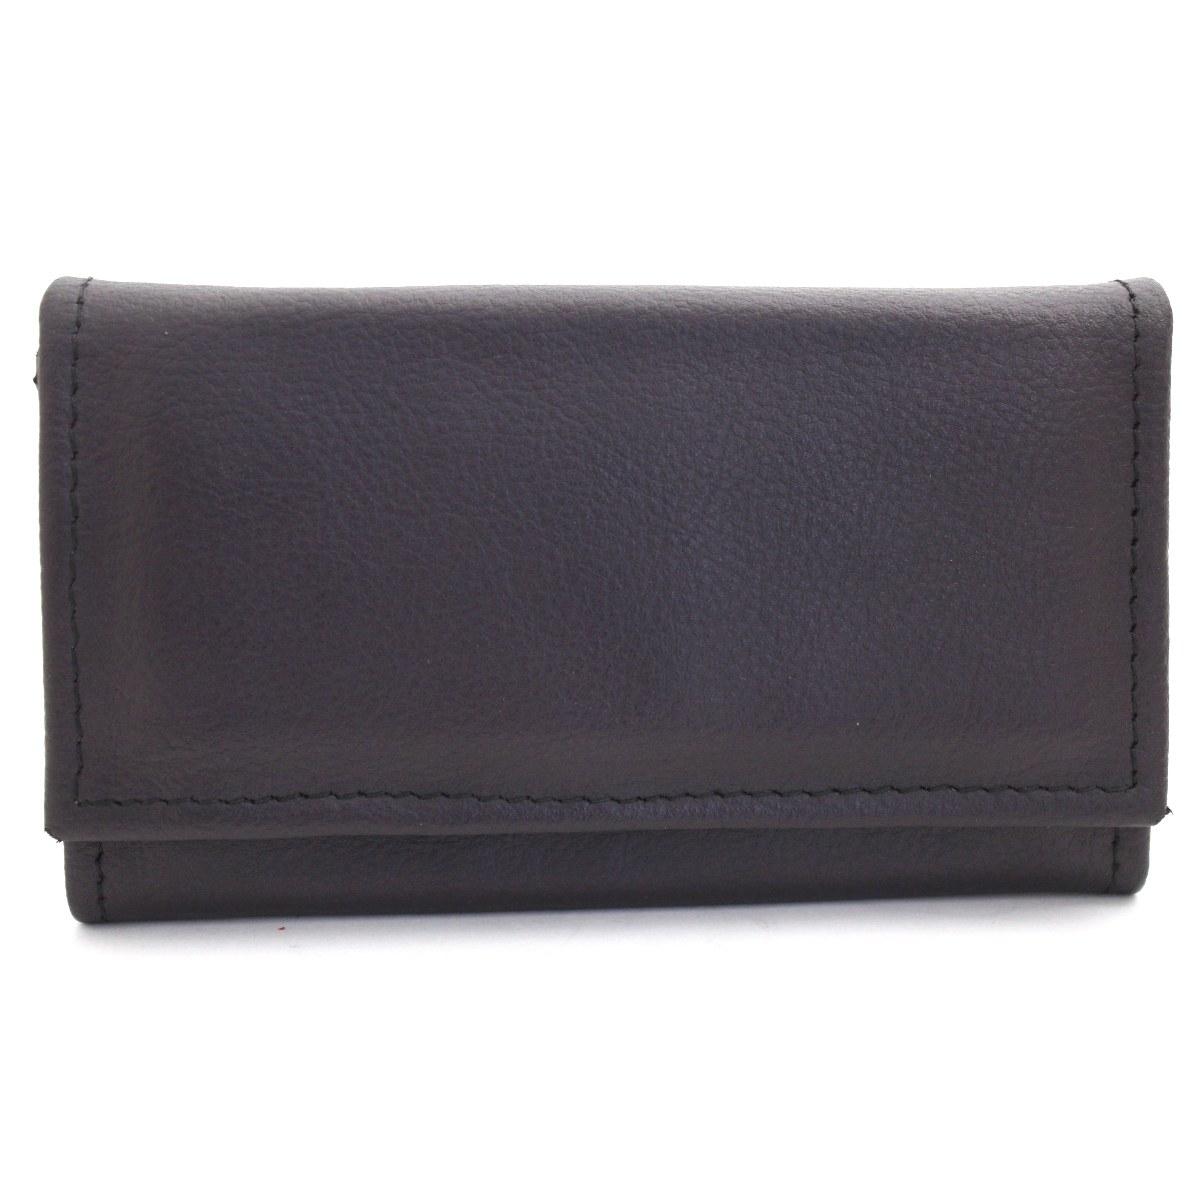 лилаво дамско портмоне естествена кожа